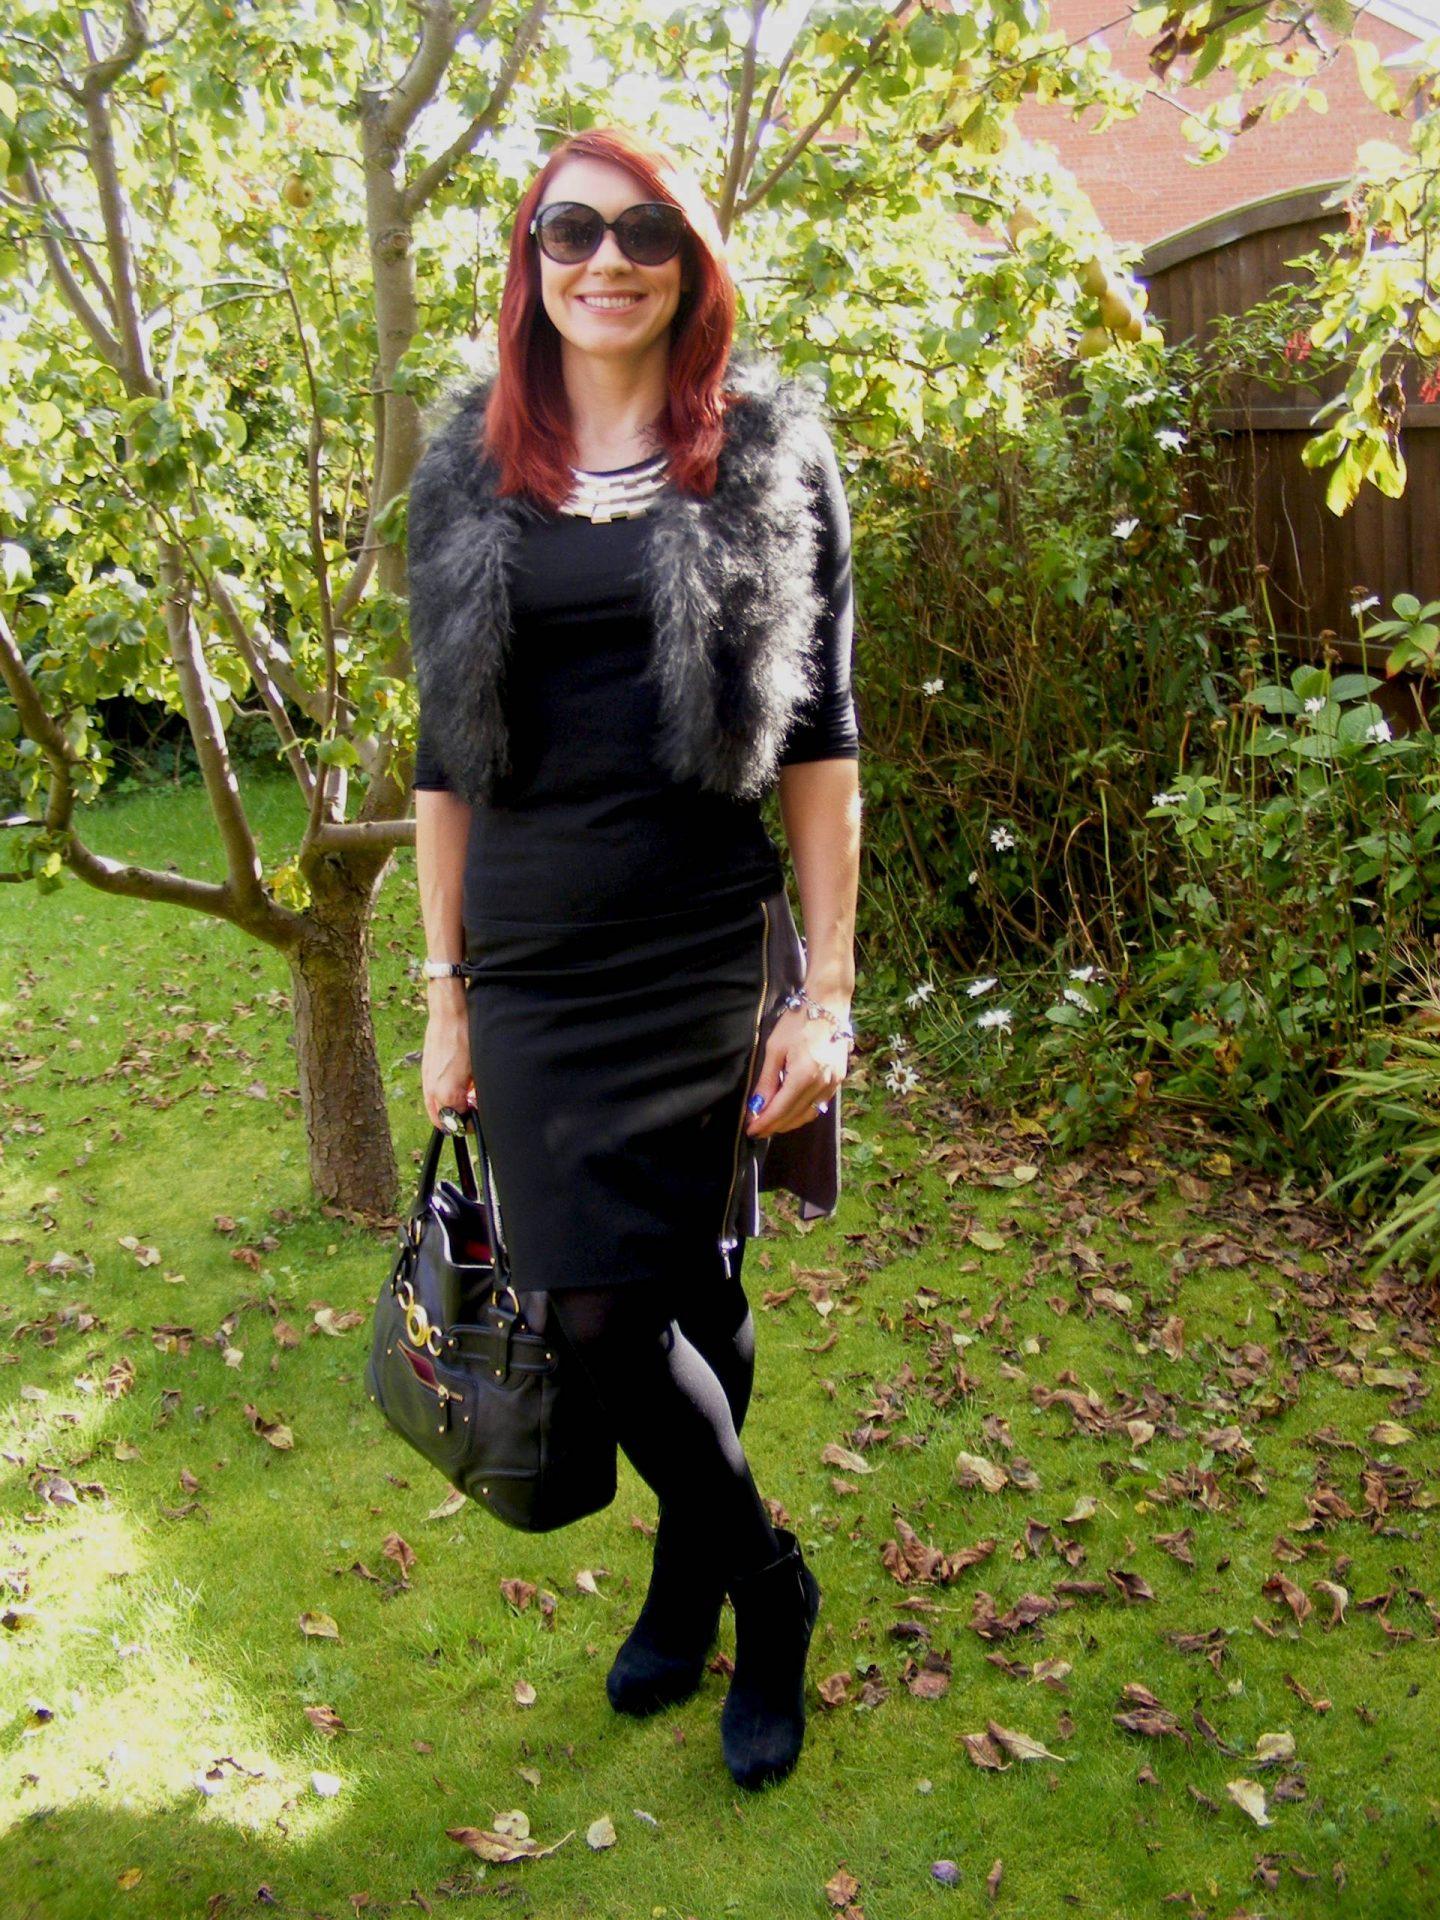 Asos Faux Fur Gilet and Karen Millen Skirt